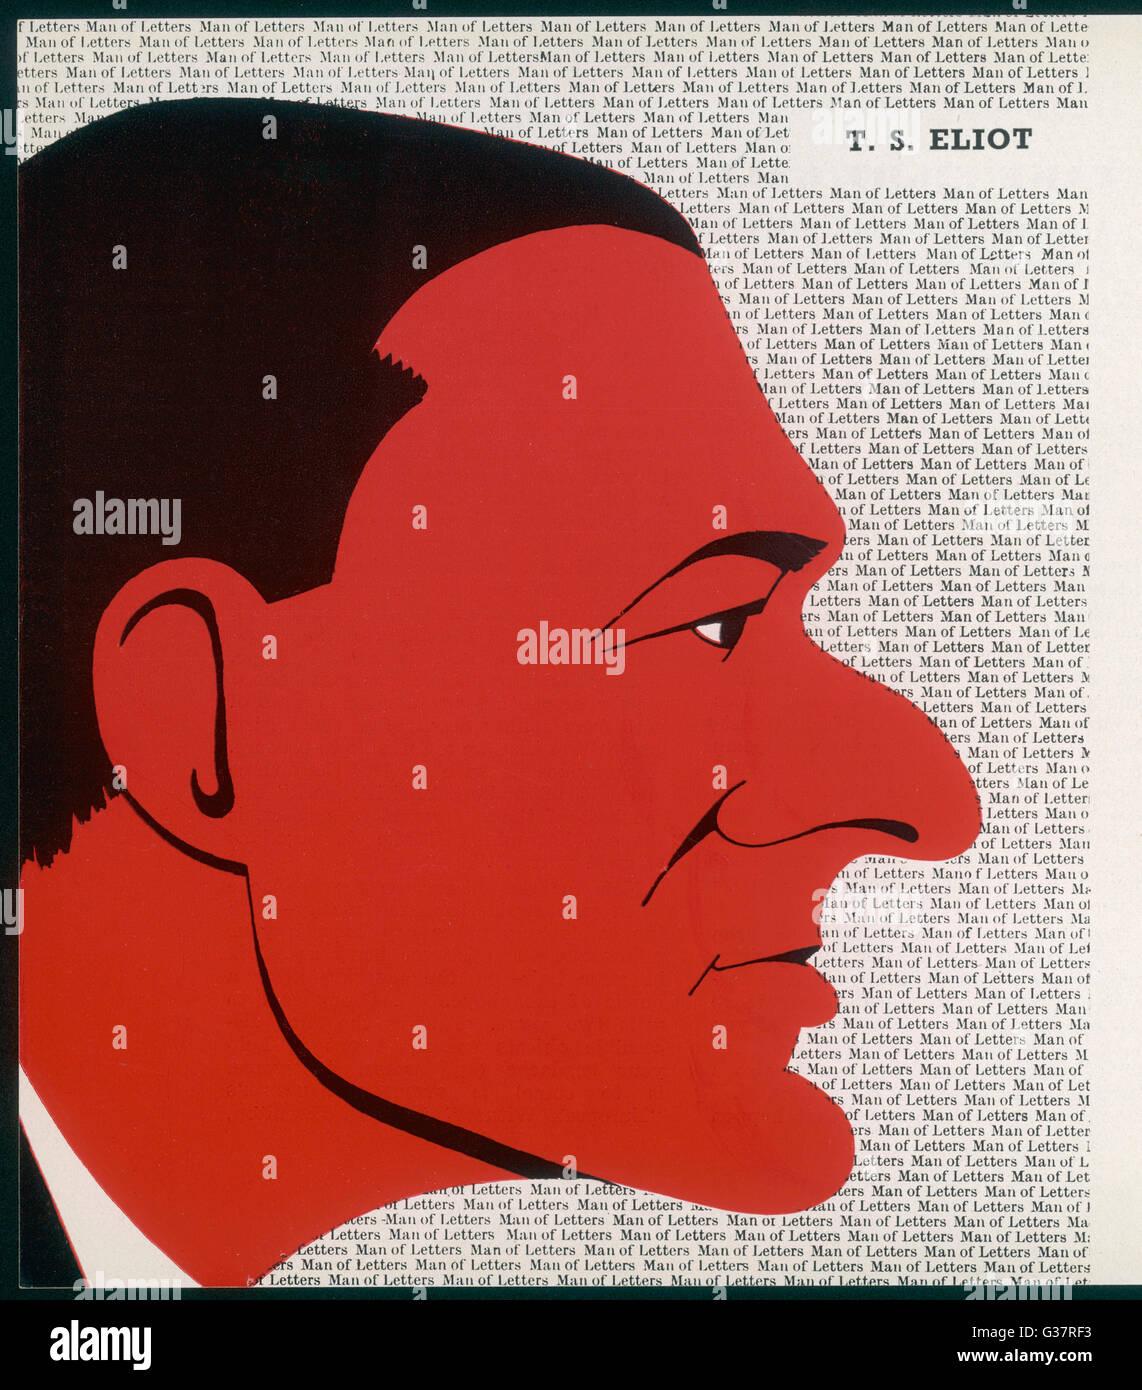 T.S.ELIOT americano nacido escritor Fecha: 1888 - 1965 Imagen De Stock